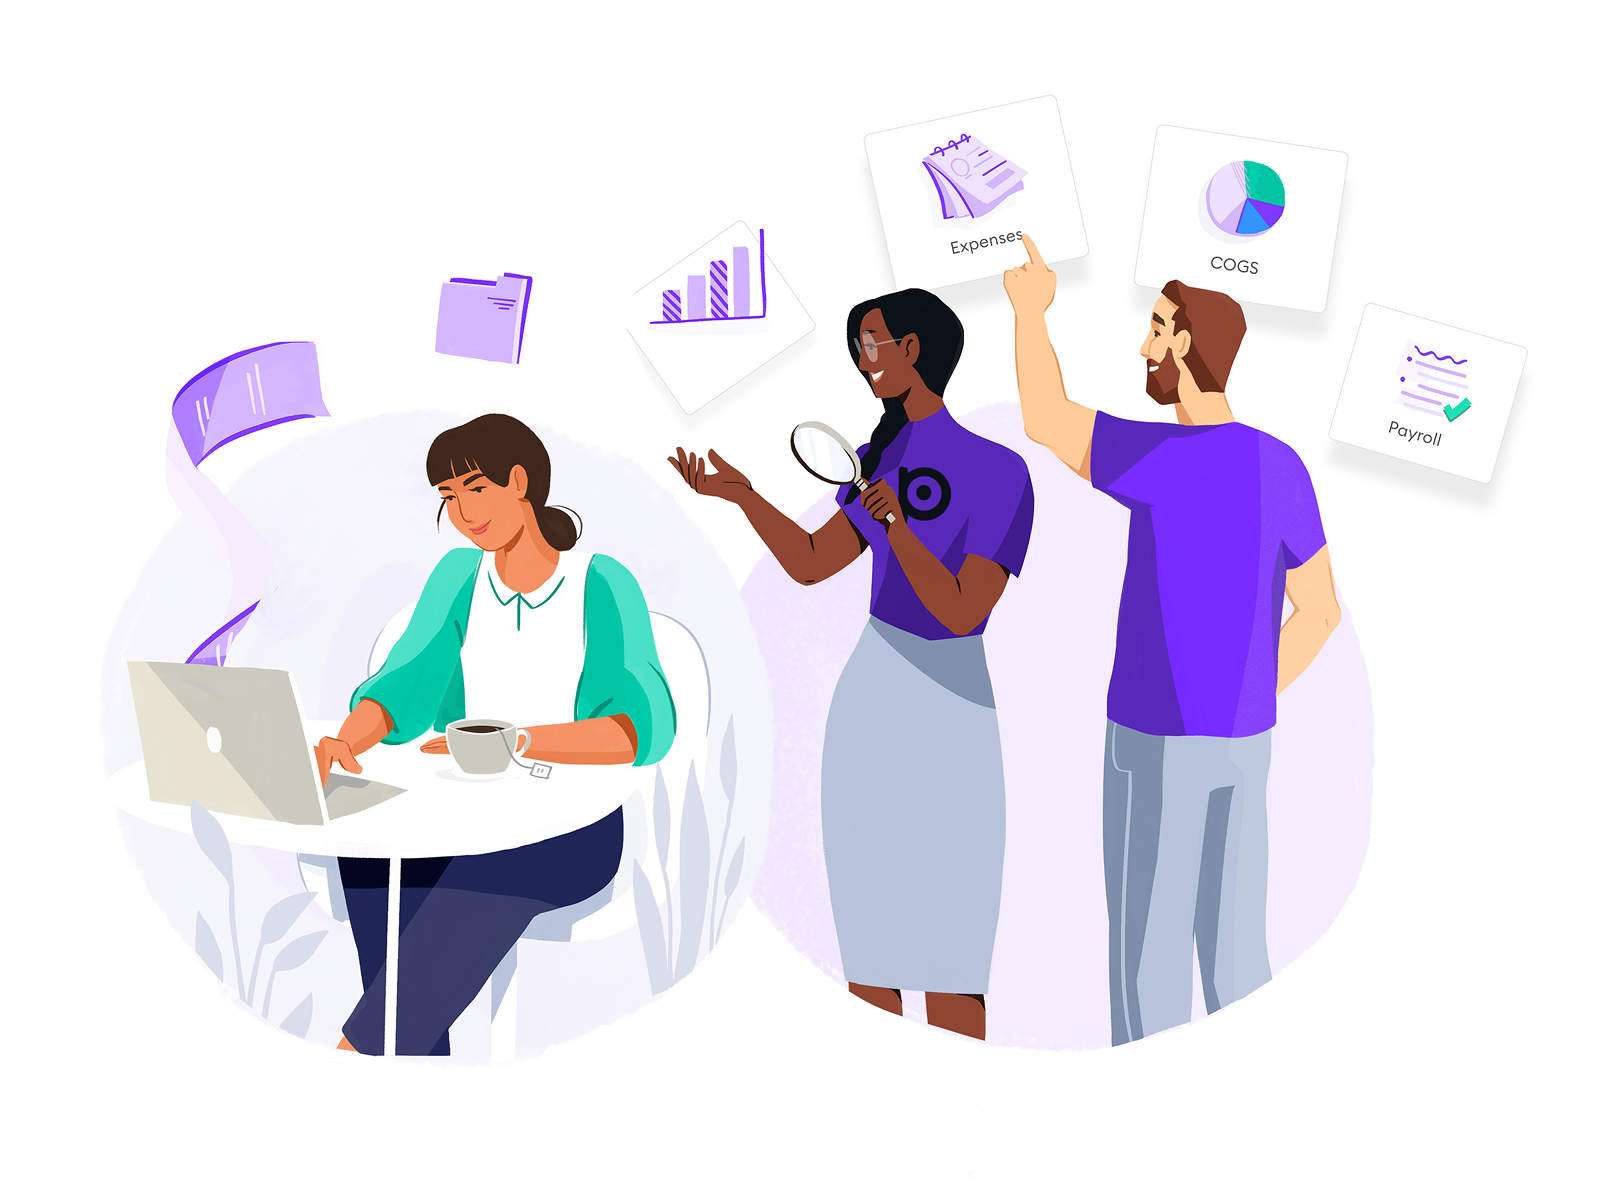 Illustration showing teammates performing finance tasks.